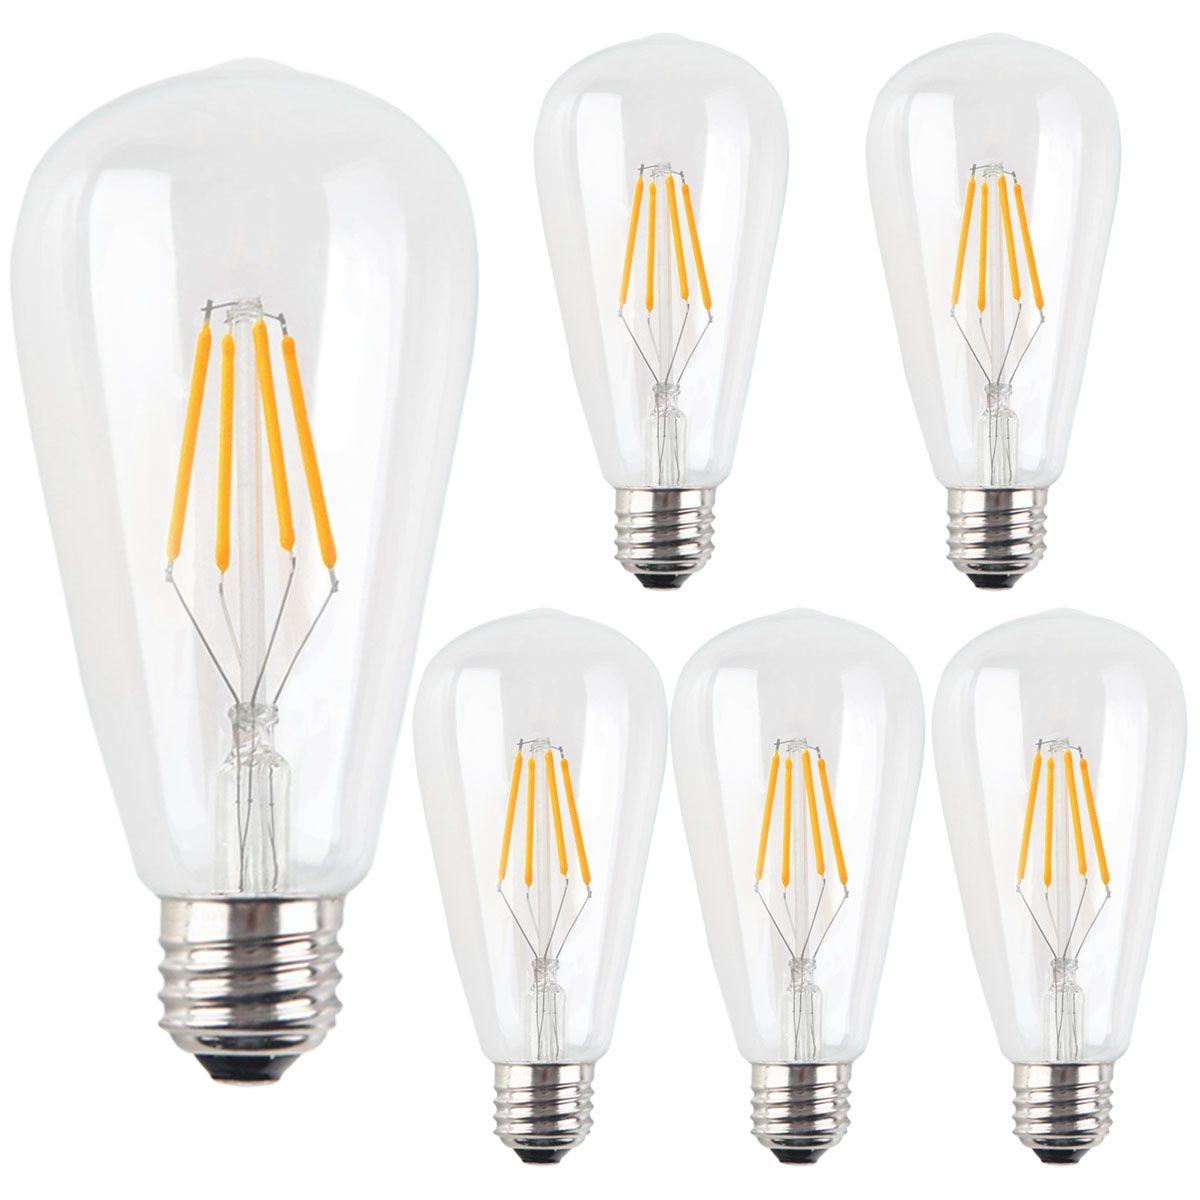 1000 images about lightbulb things on pinterest lightbulbs bulbs - Bulbs